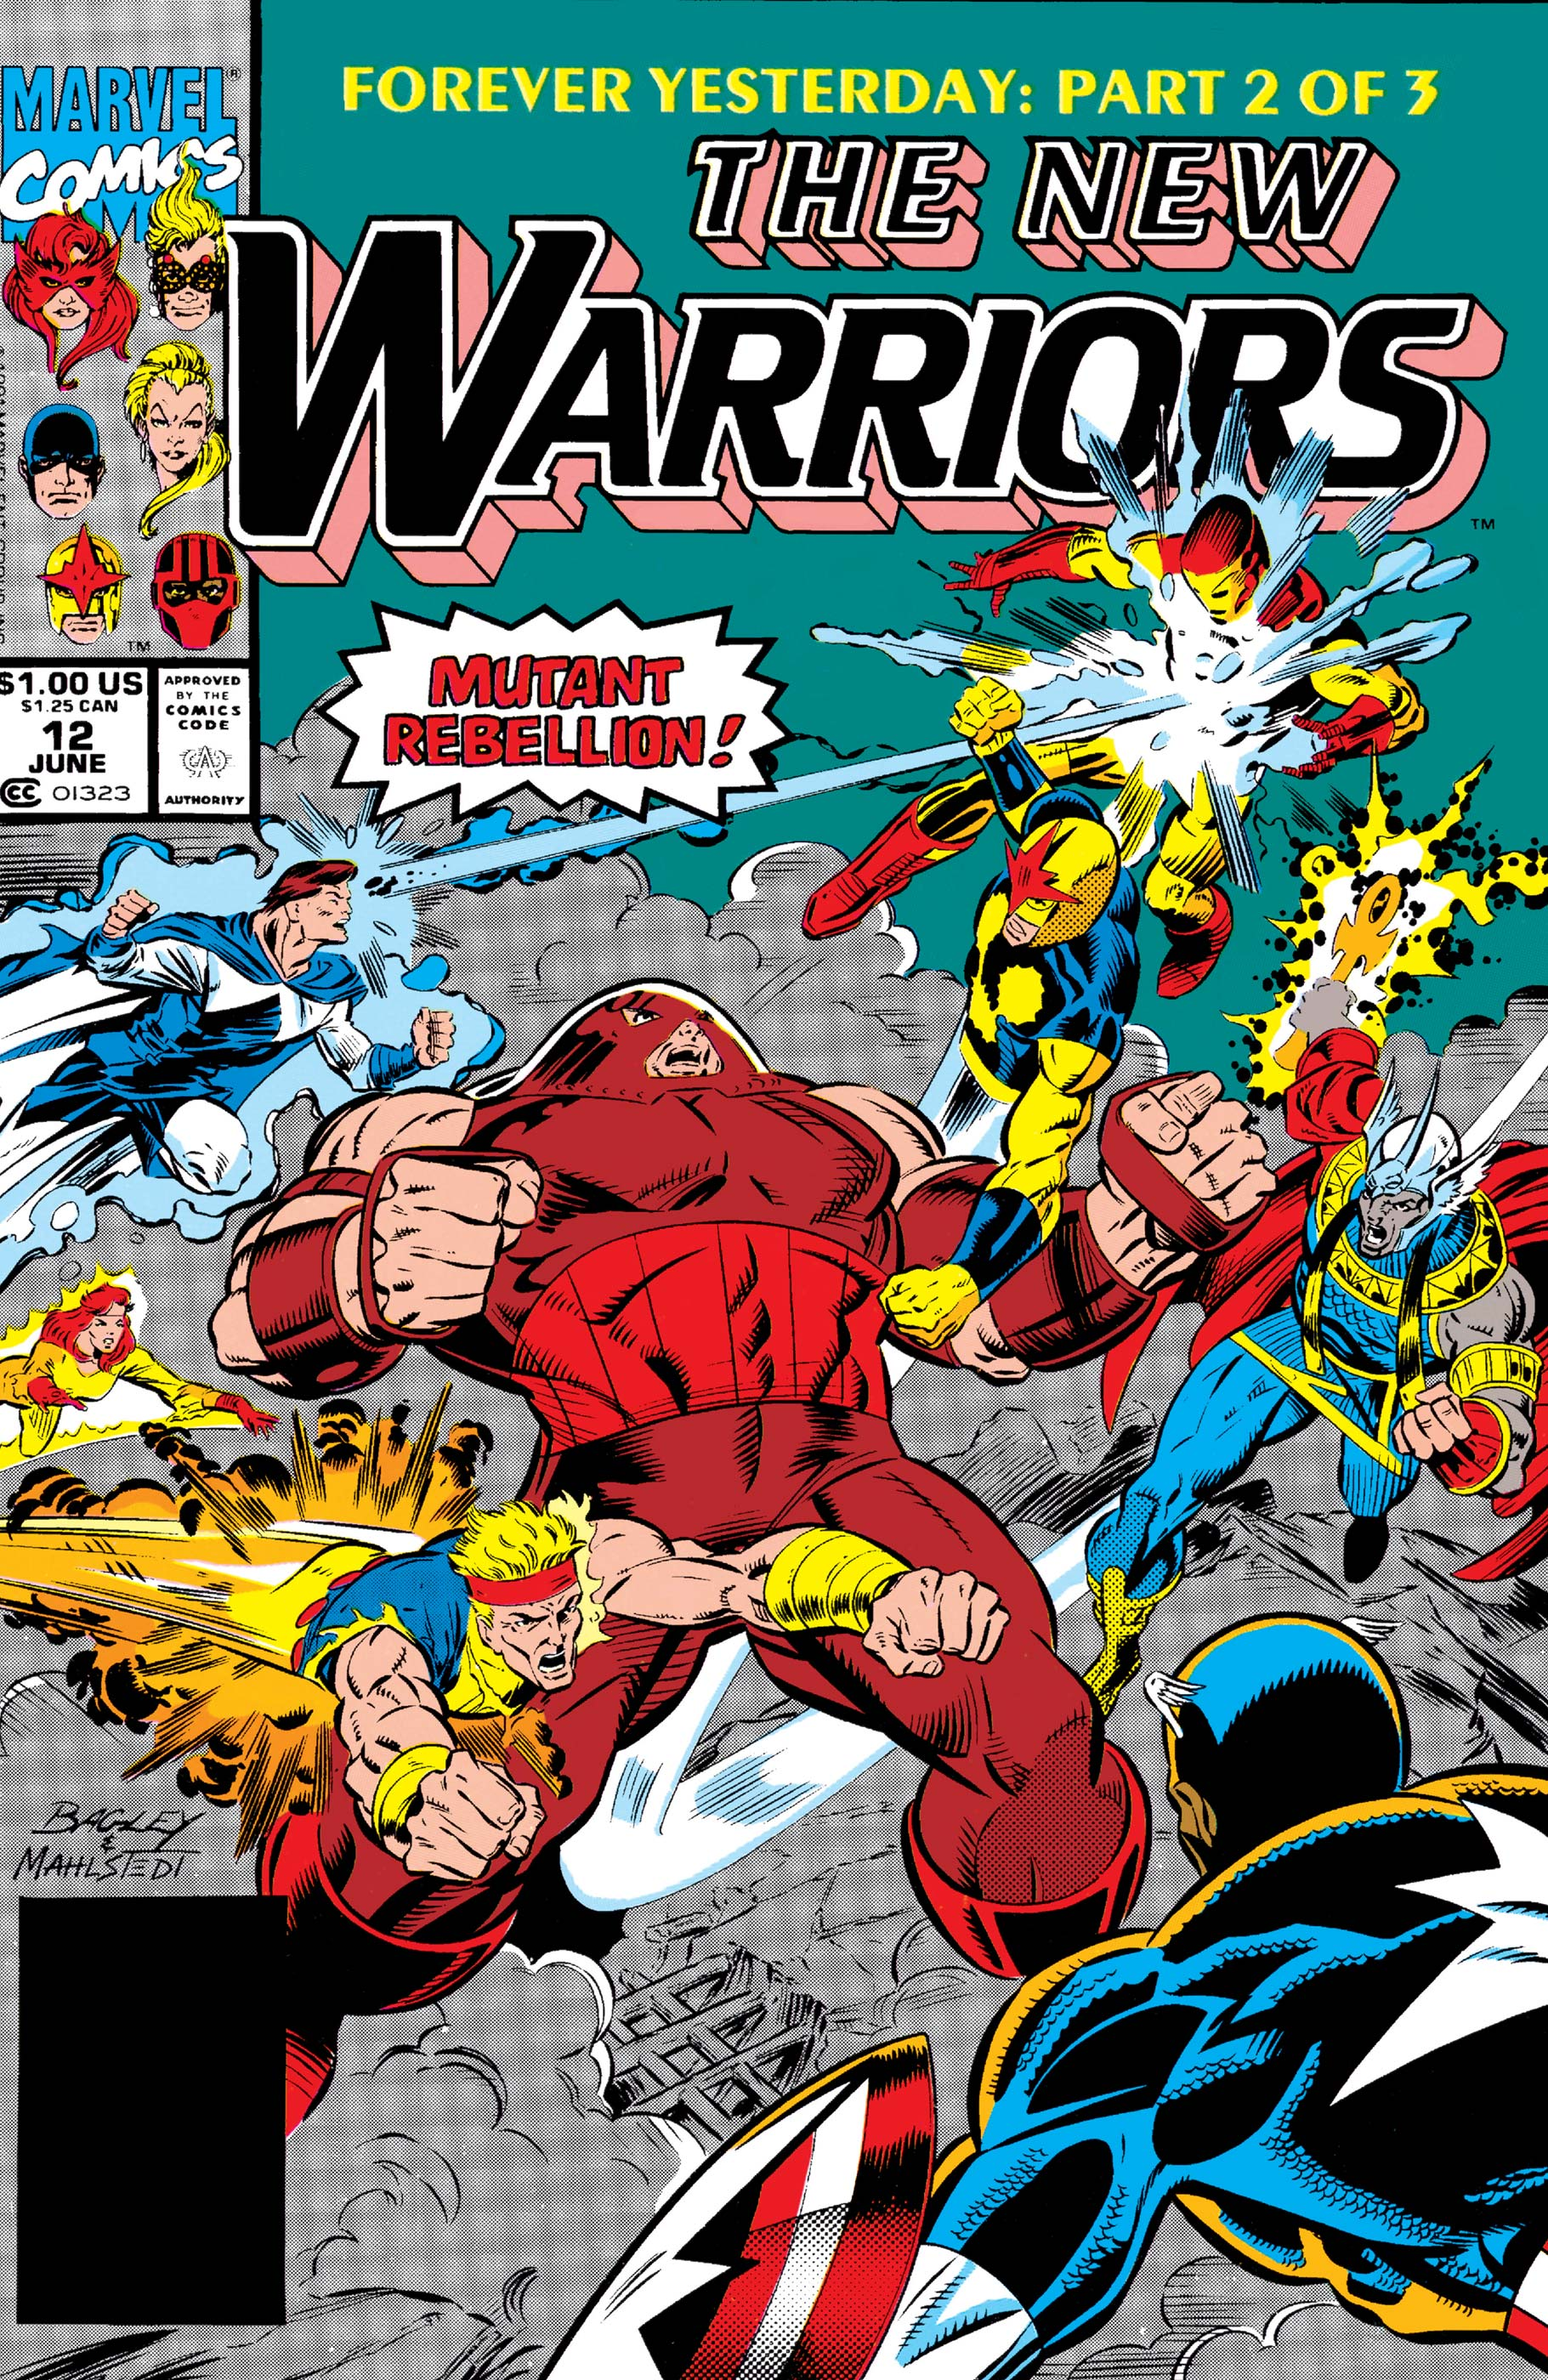 New Warriors (1990) #12